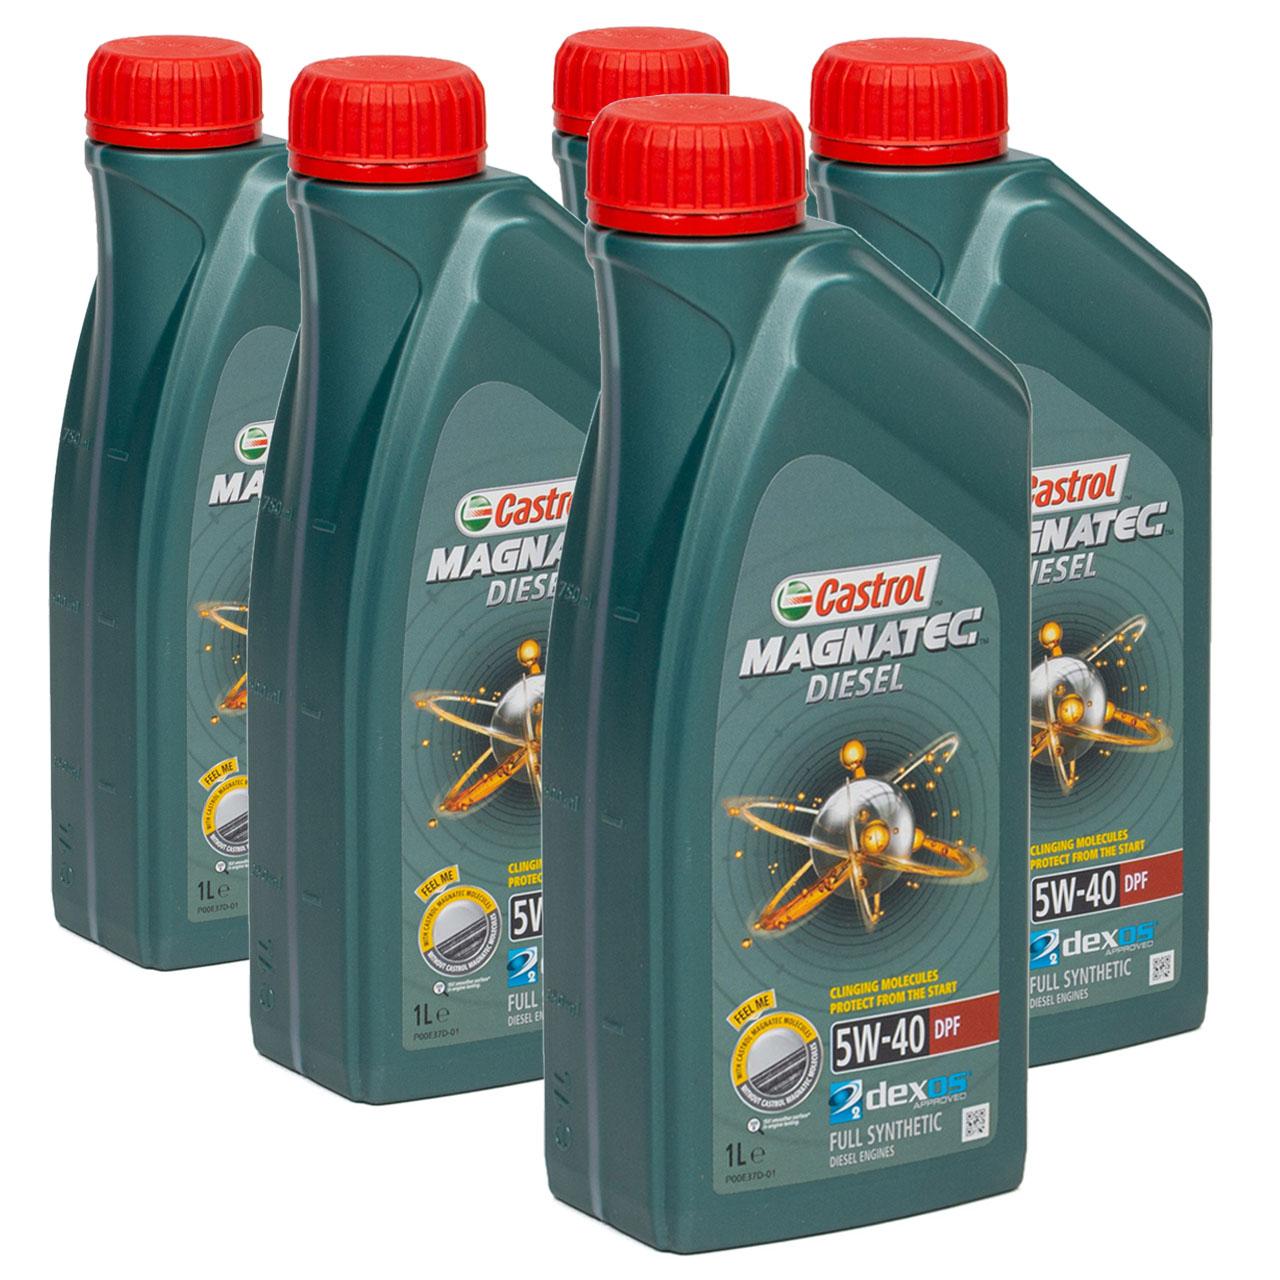 CASTROL Magnatec DIESEL DPF Motoröl Öl 5W40 dexos2 Ford WSS-M2C917-A - 5 Liter